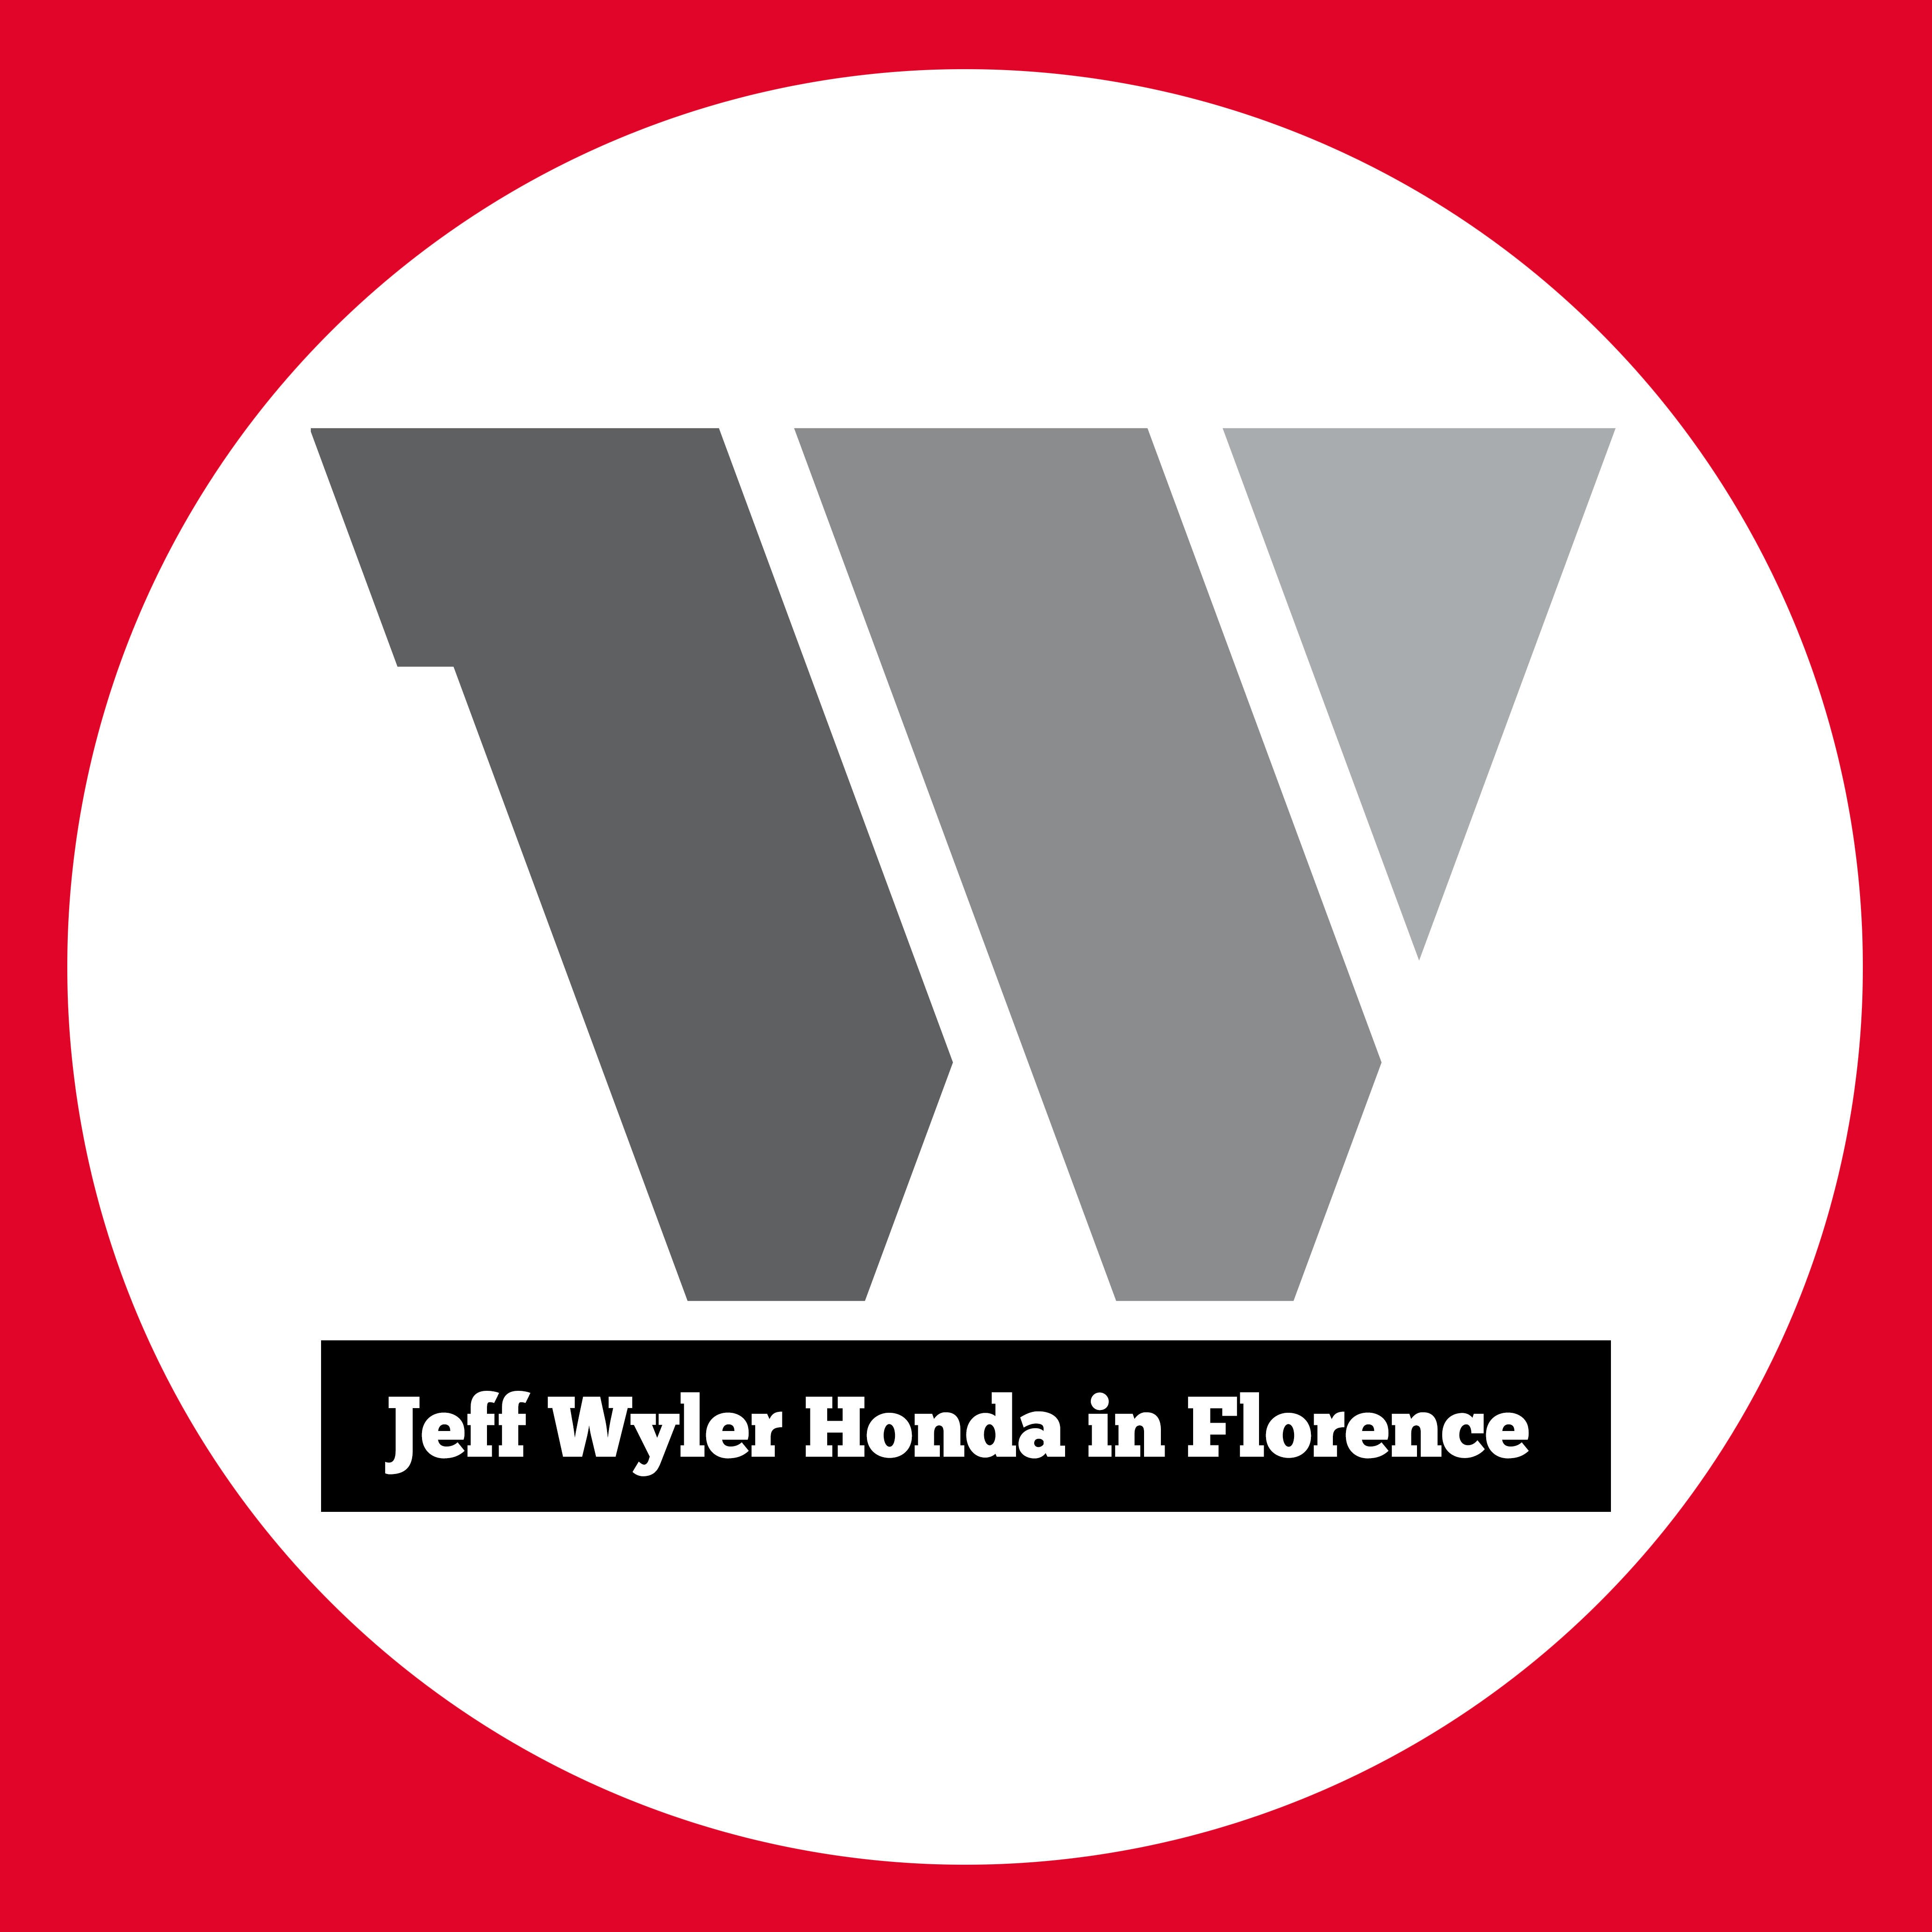 Jeff Wyler Honda in Florence